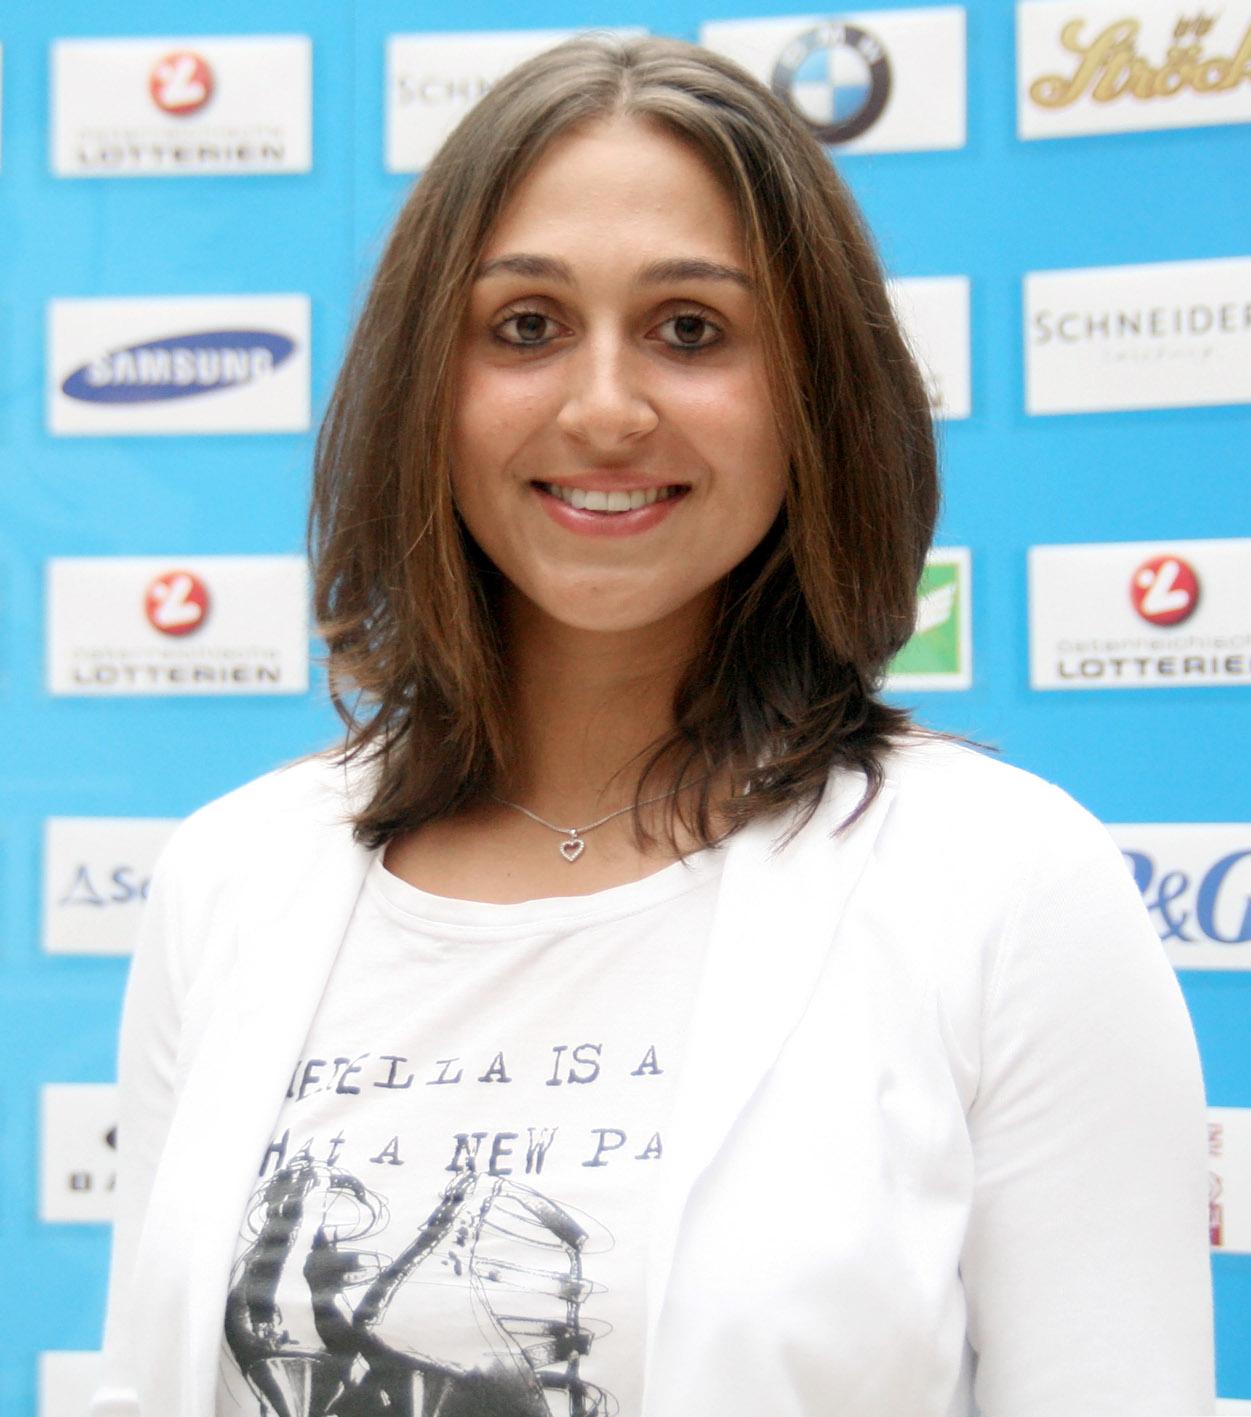 Tamira Paszek Austrian_Olympic_Team_2012_a_Tamira_Paszek